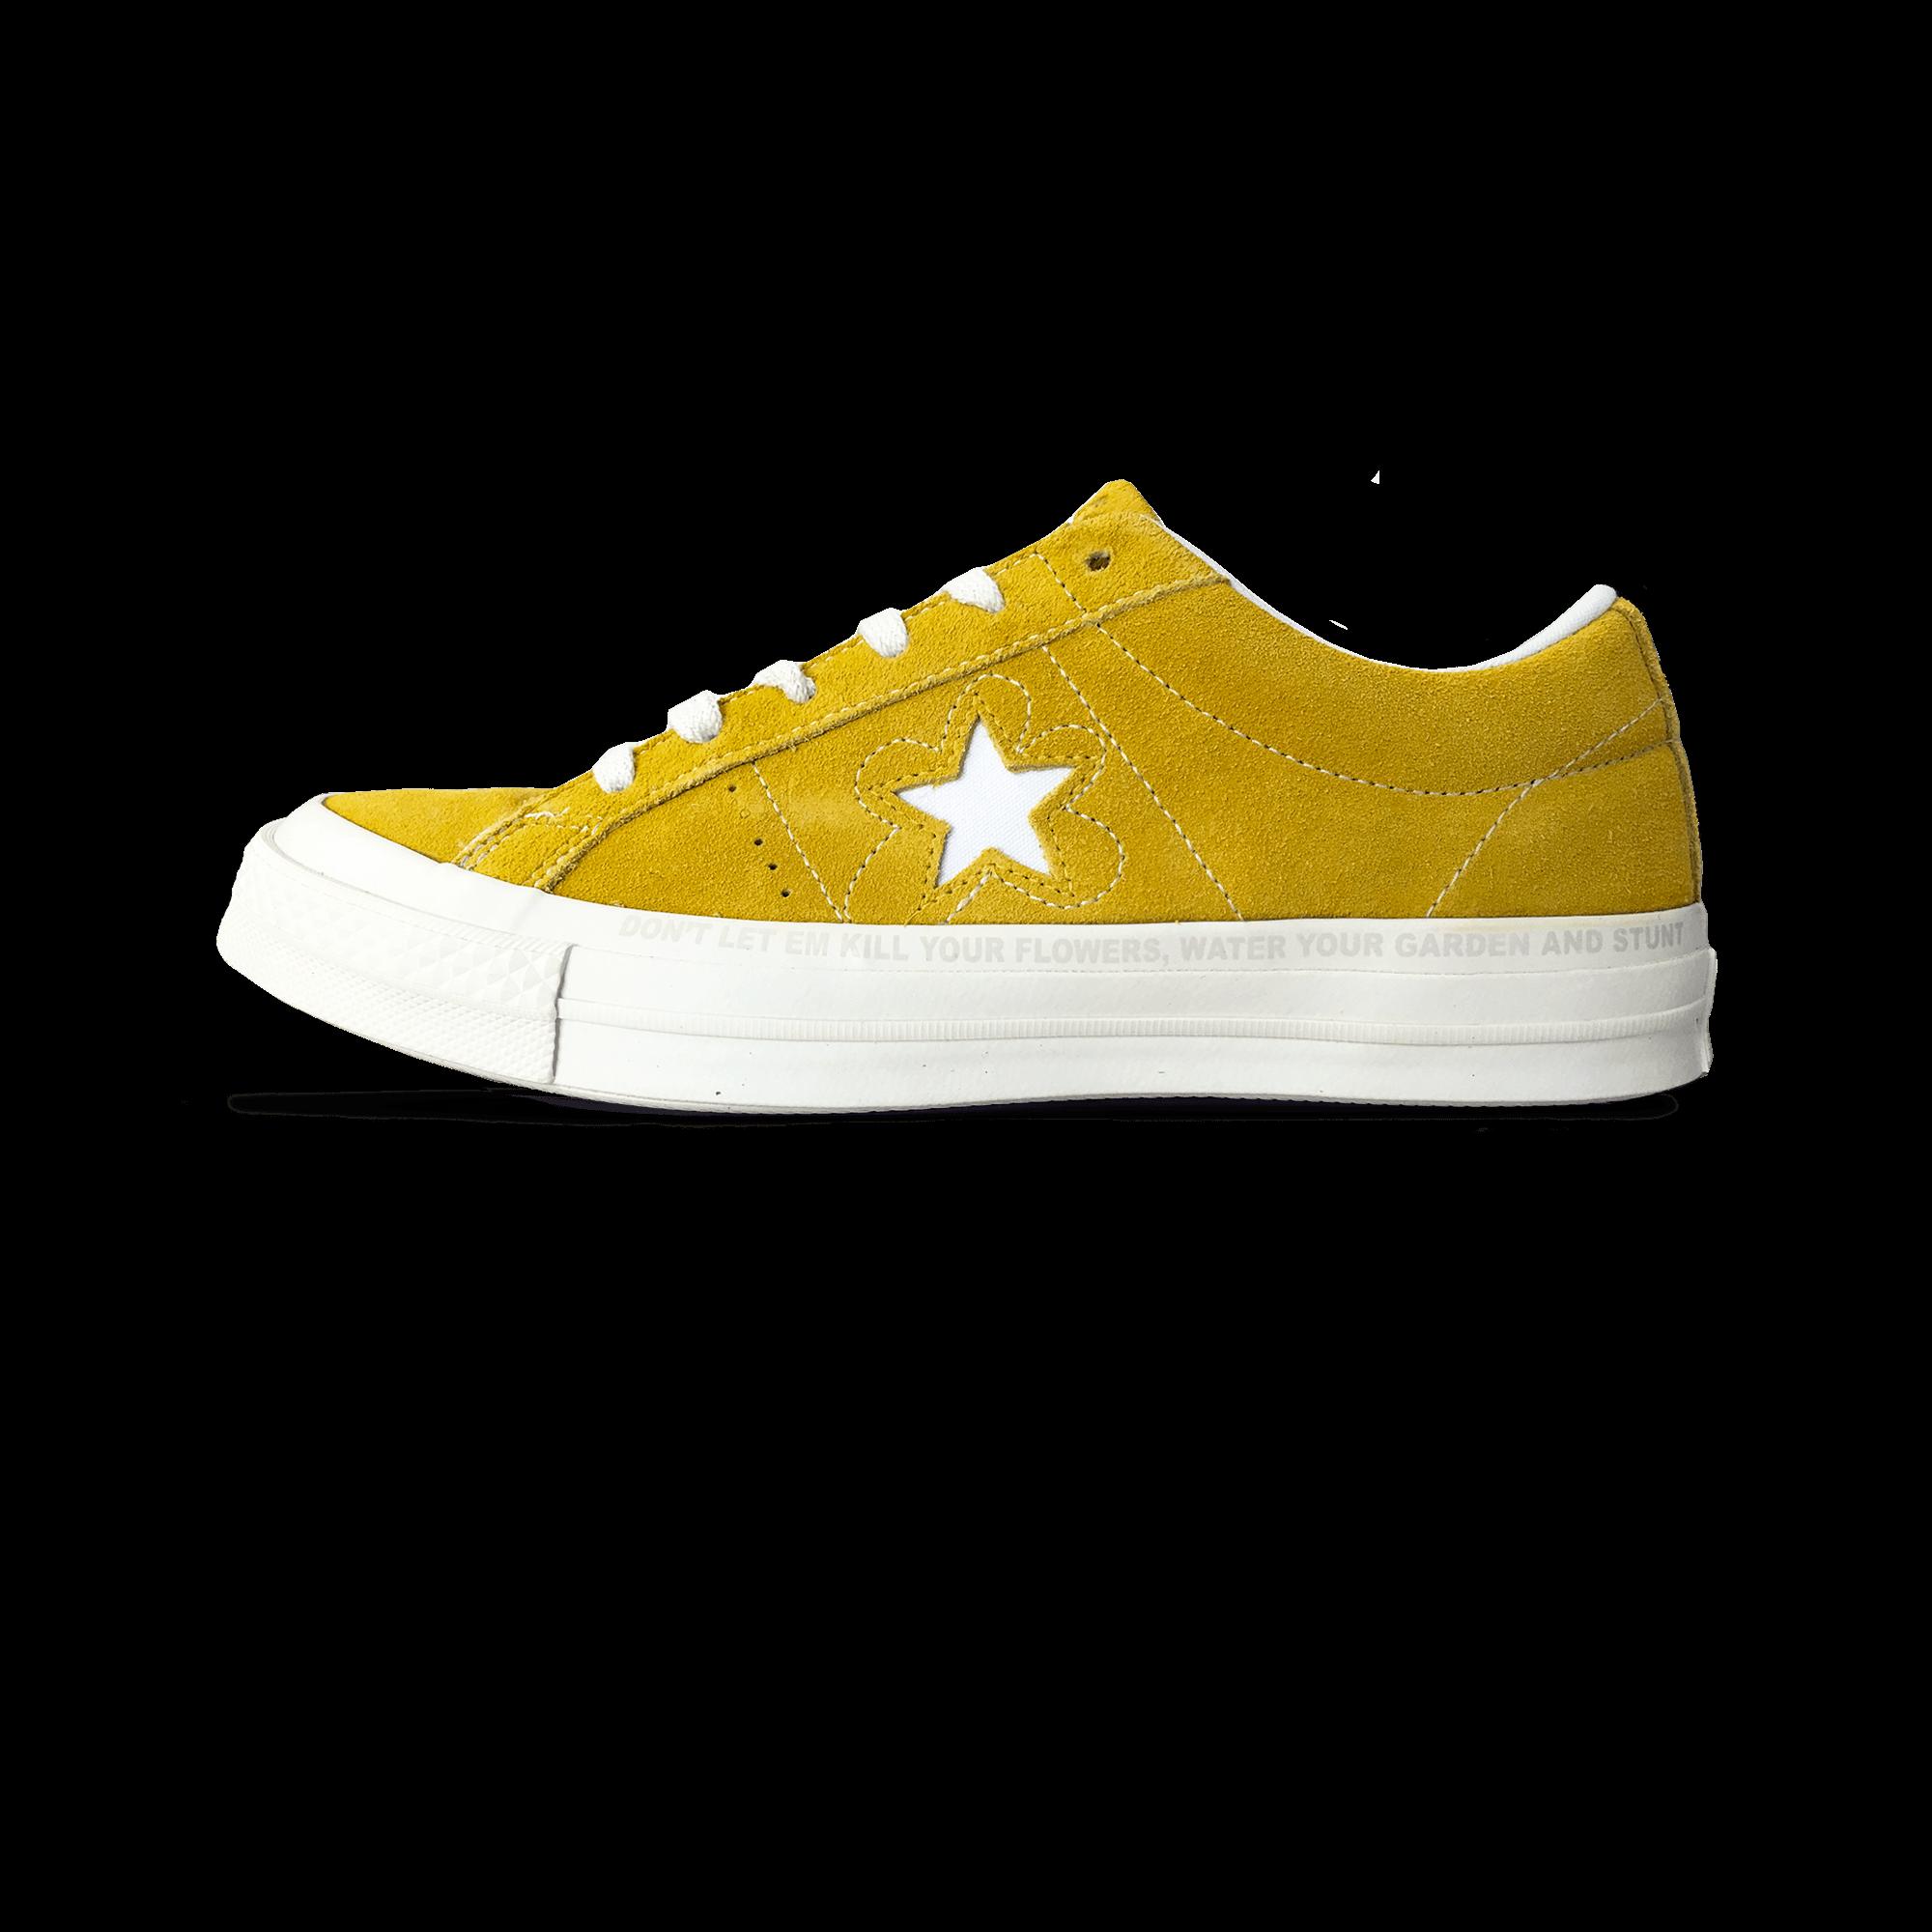 0d98b99432d Converse One Star x Golf Le Fleur sulphure white - Unisex ...